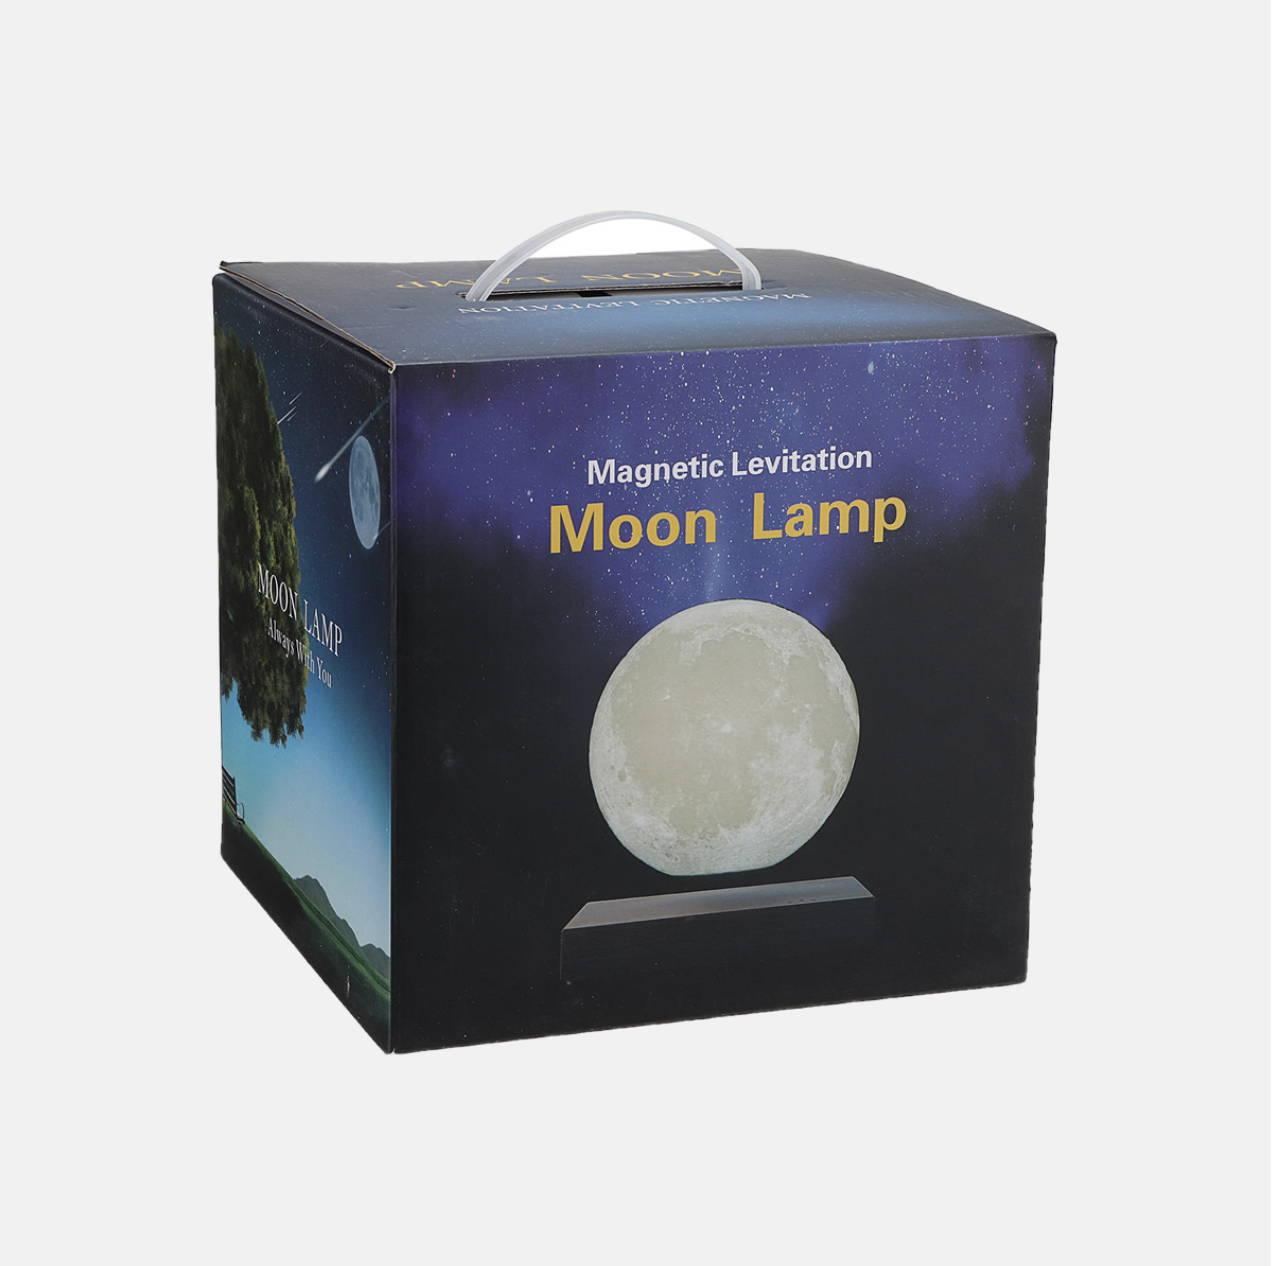 Moon Lamp Bundle, Floating 3D Moon Lamp, Magnetic Levitating Moon Lamp, Cool Moon Lamps